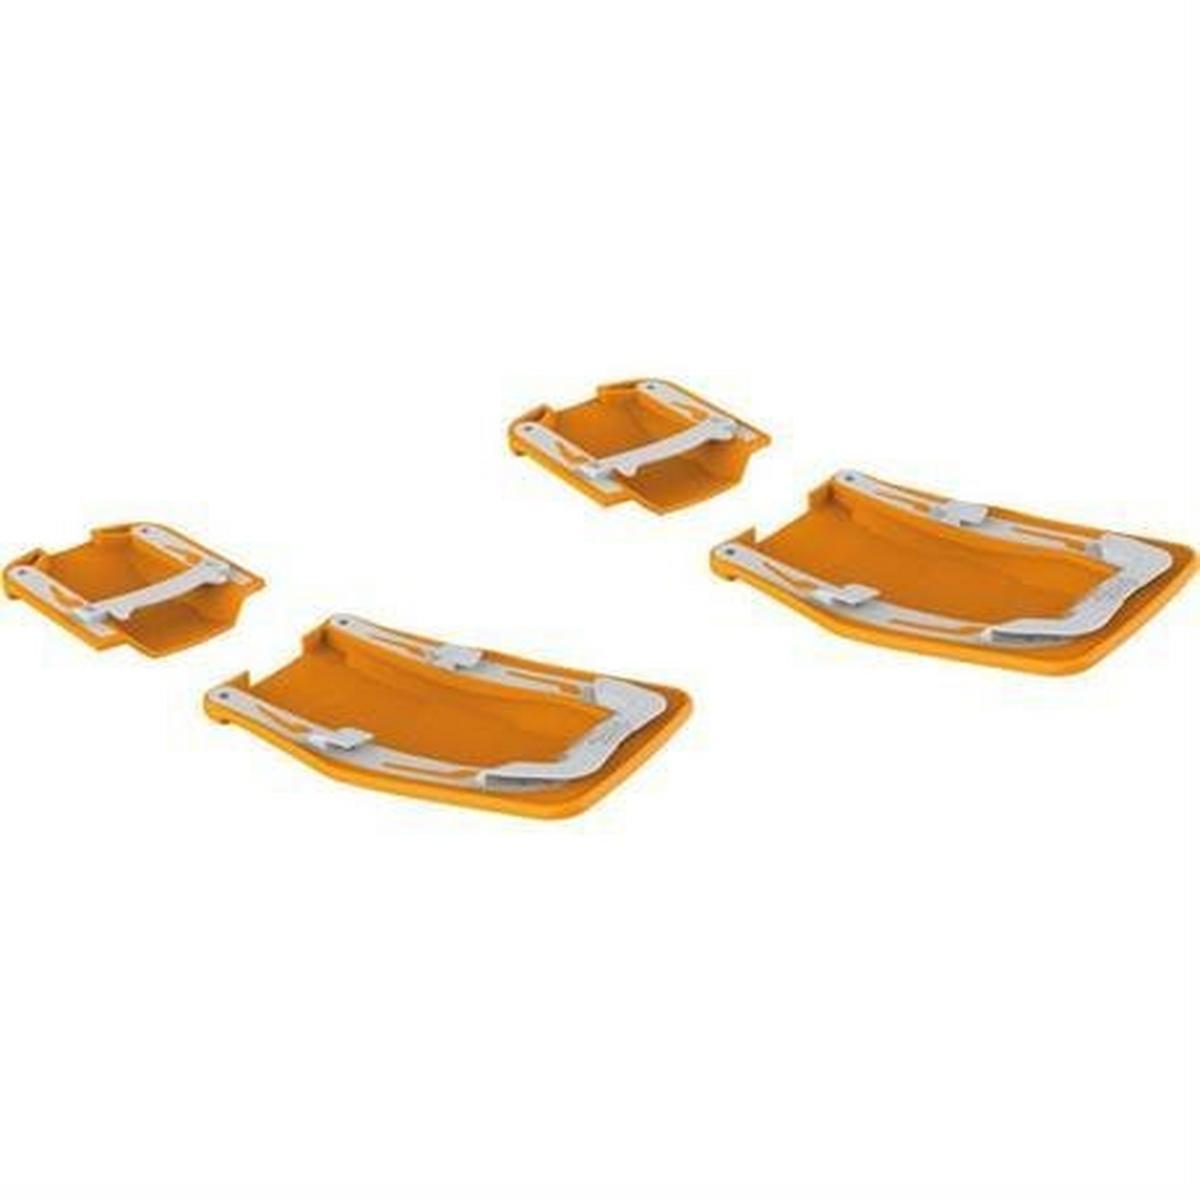 Petzl Charlet Petzl Spare/Accessory Crampons Antisnow Anti-Balling Plate for Vasak and Sarak